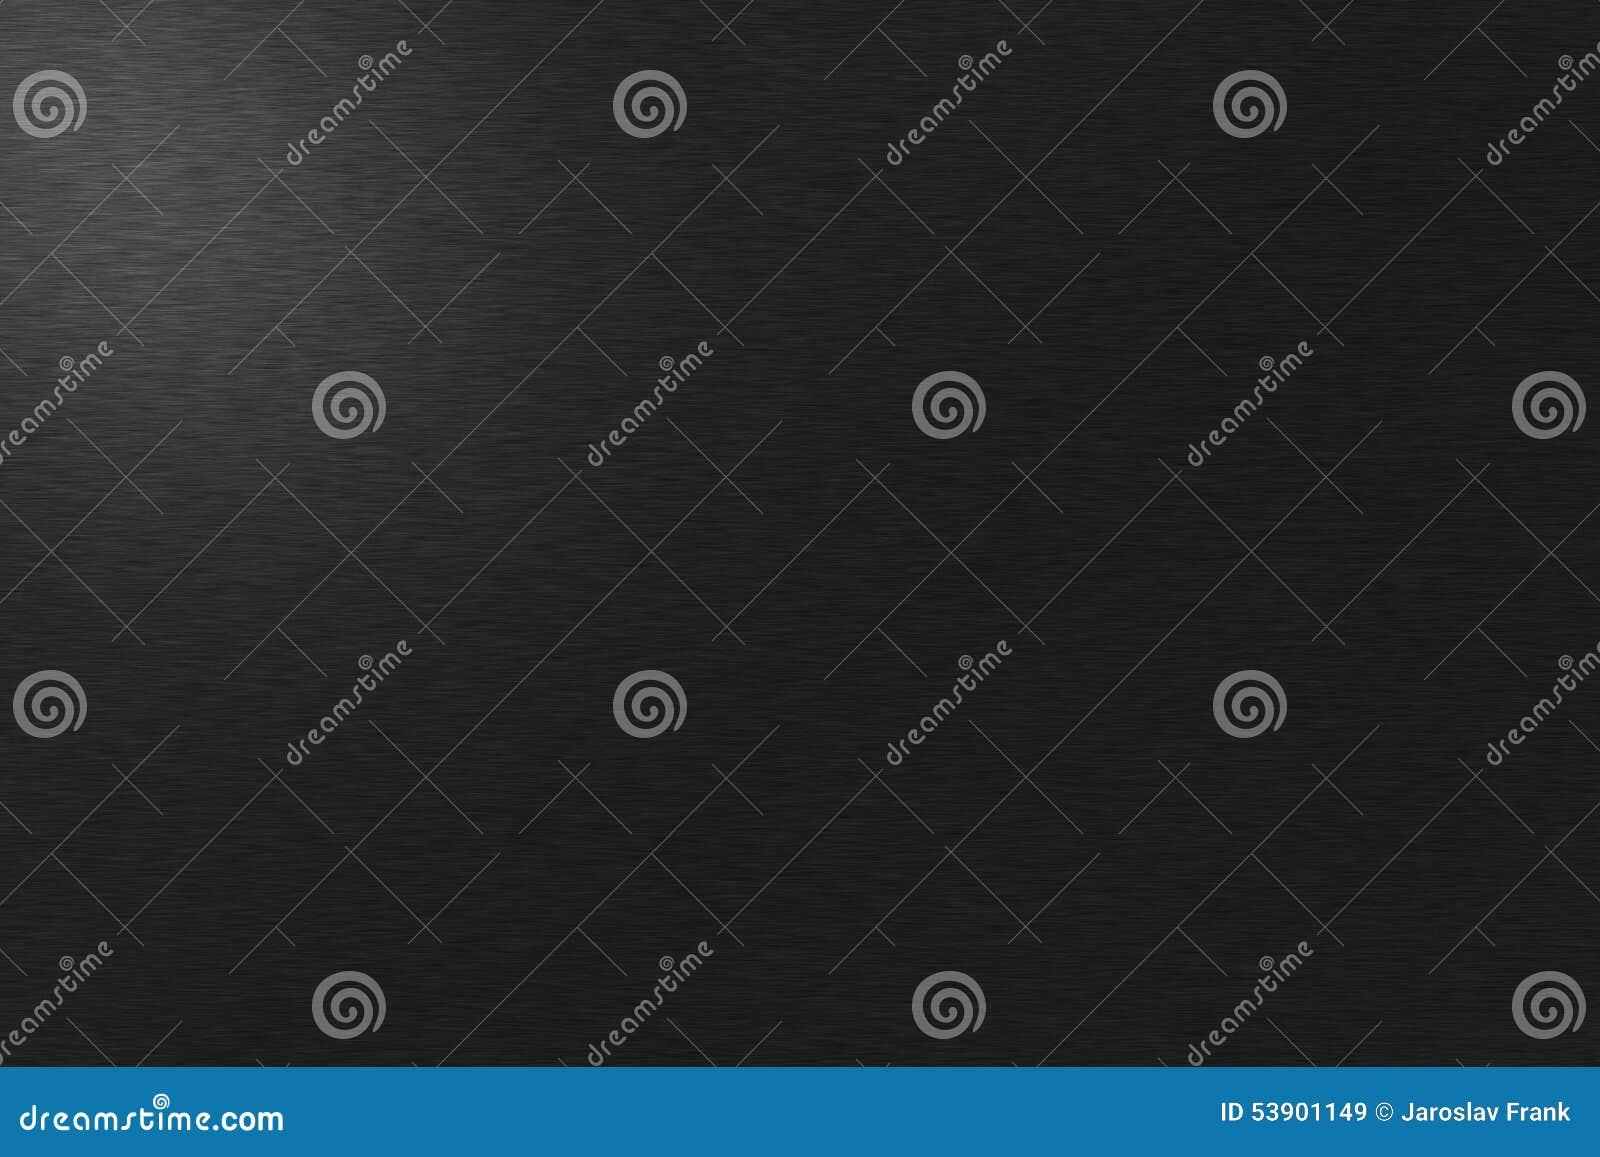 Background Position Bottom Left